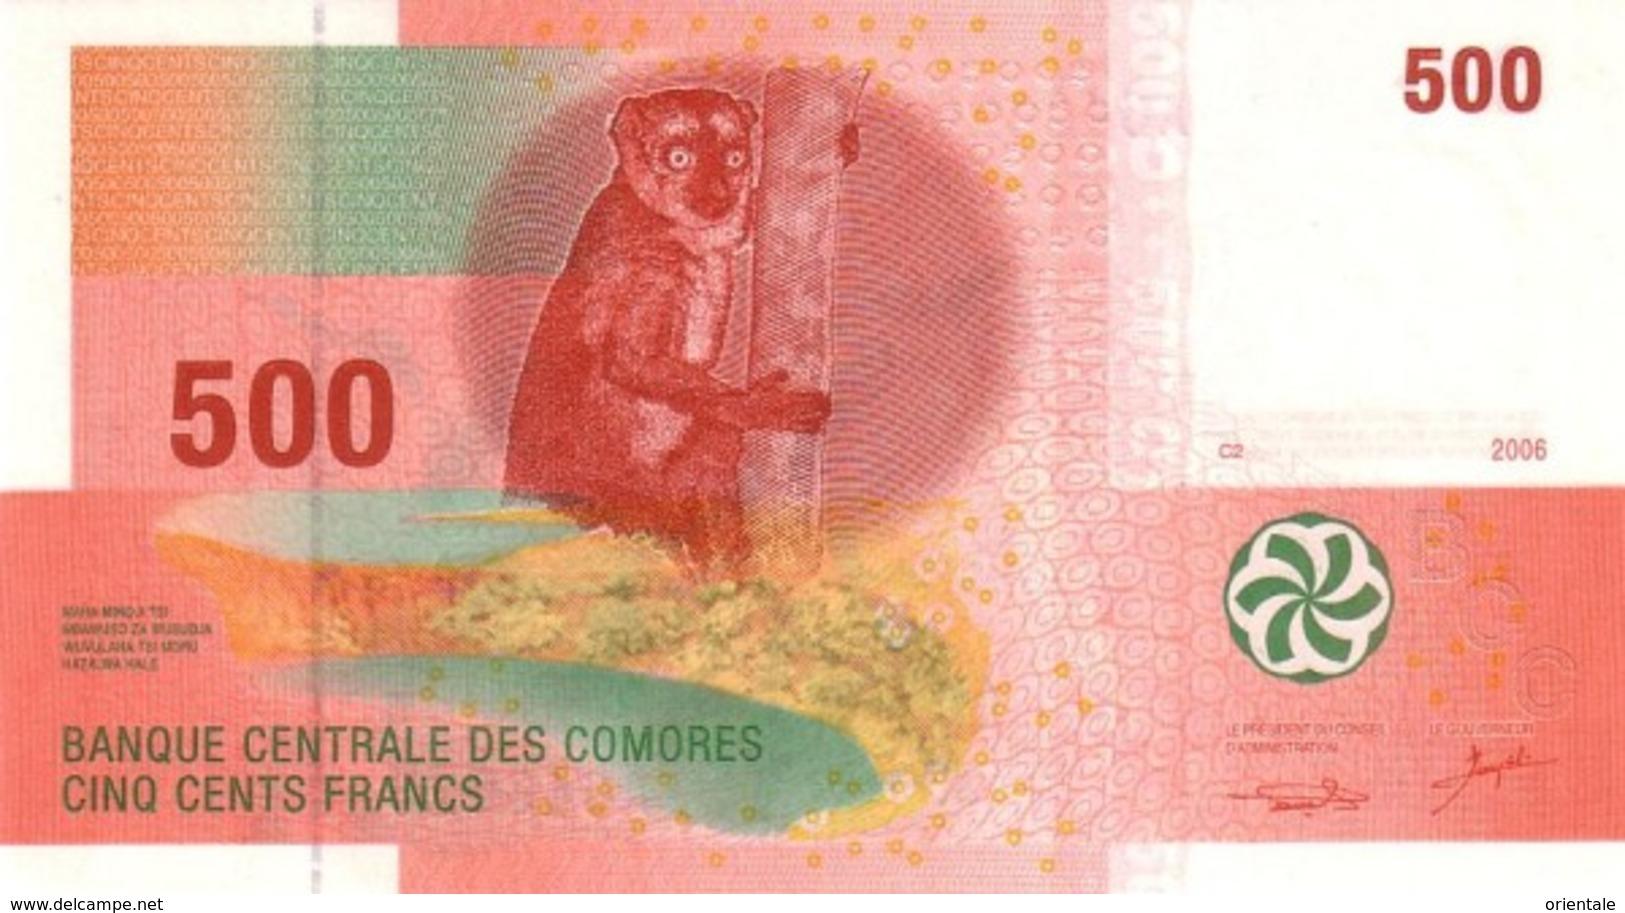 COMOROS P. 15a 500 F 2006 UNC - Comores